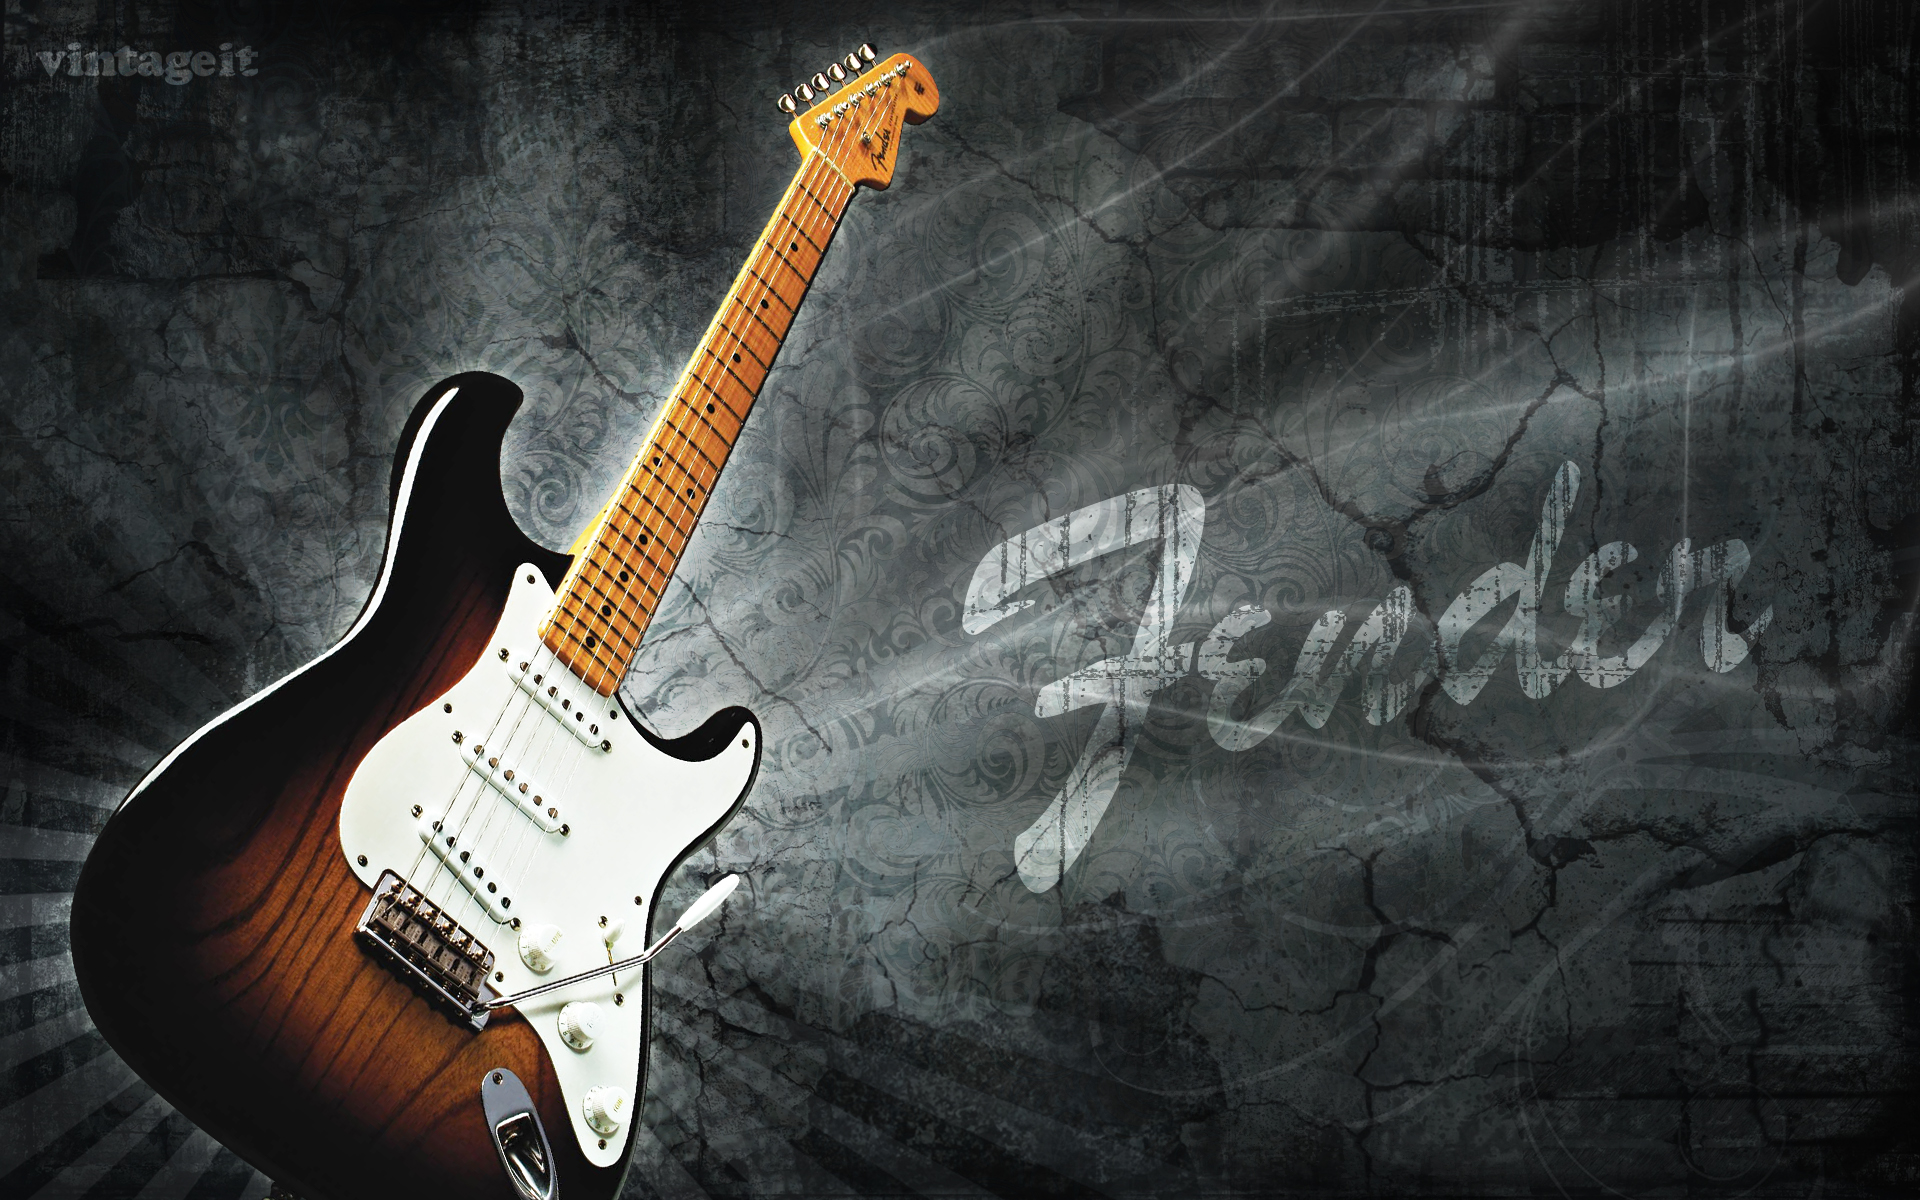 Fender Stratocaster wallpaper   Desktop HD iPad iPhone wallpapers 1920x1200